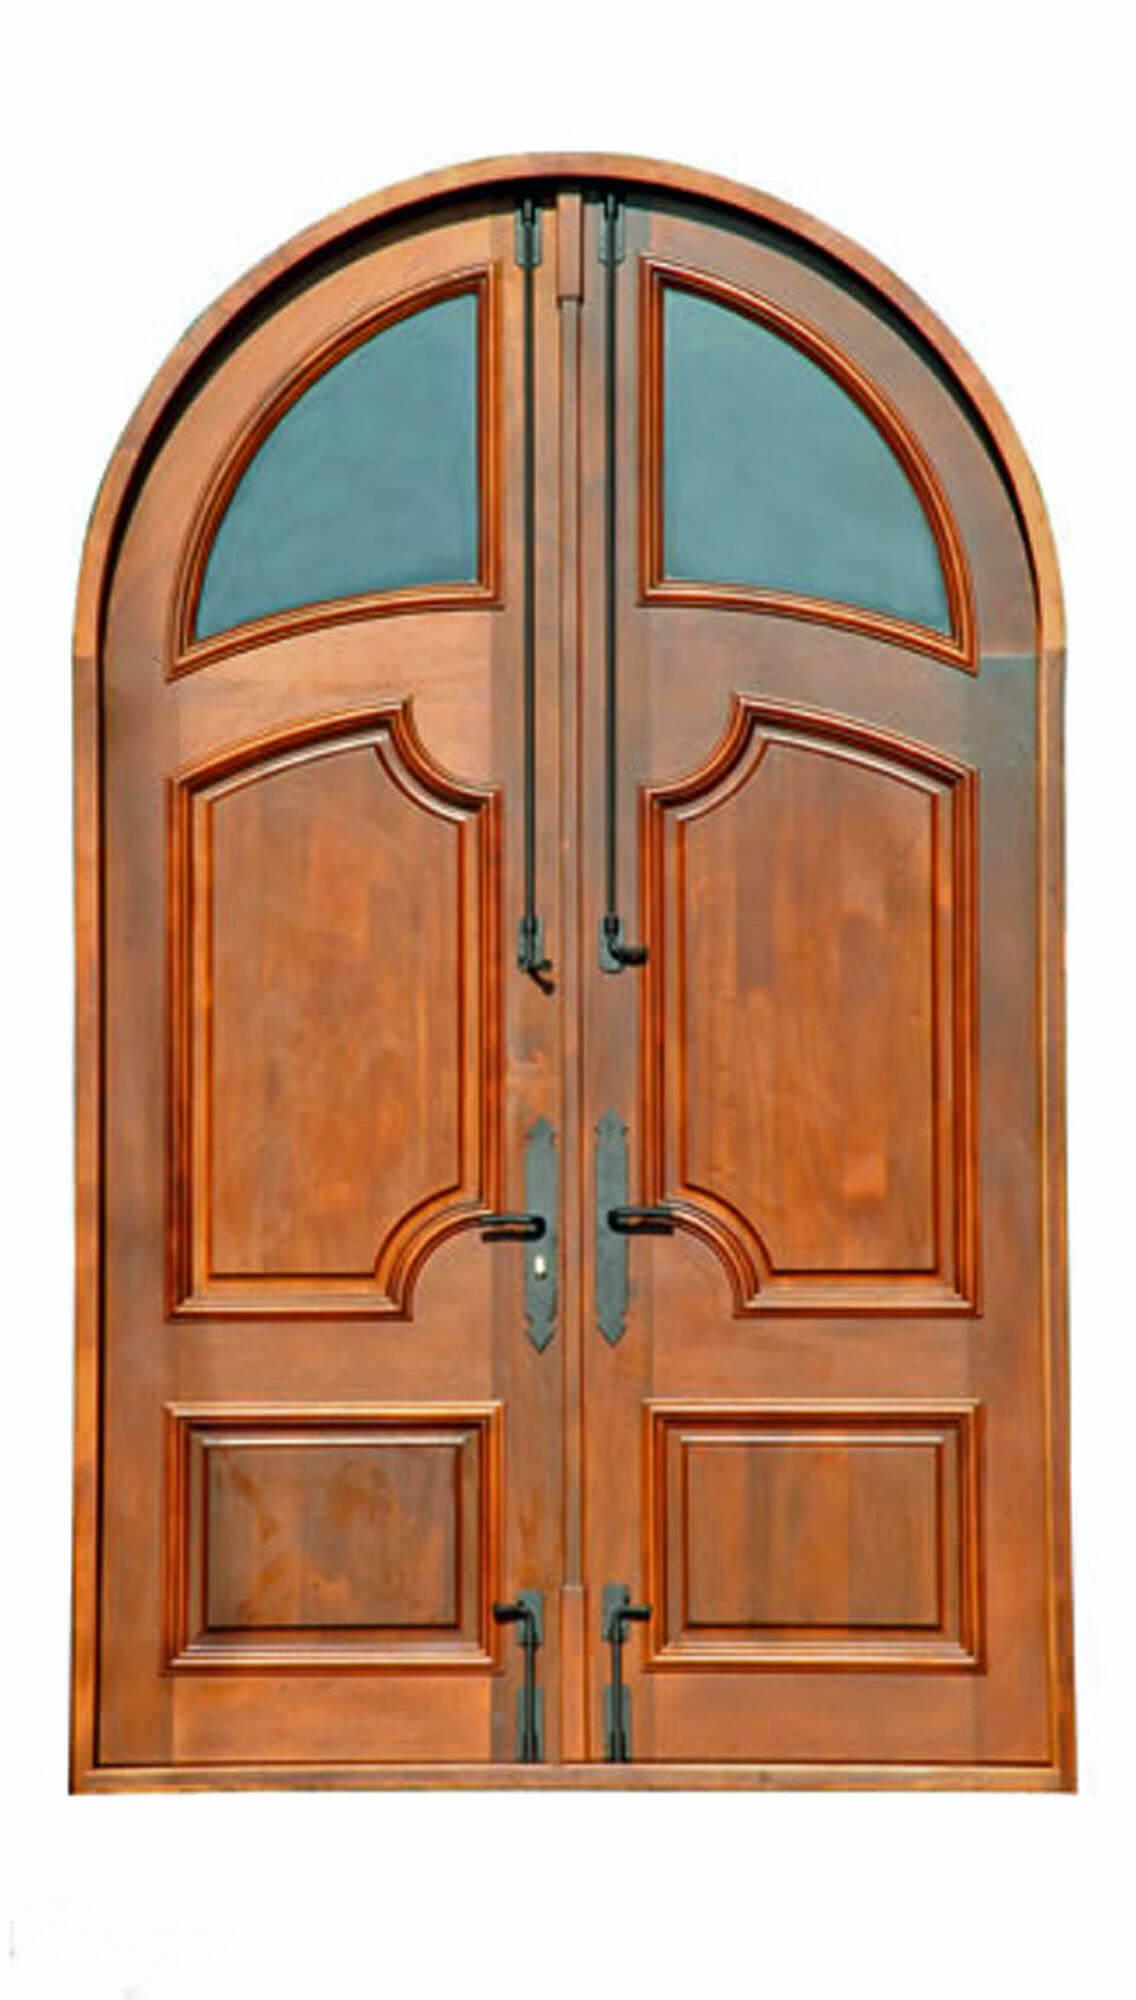 DESTIN MAHOGANY EXTERIOR CARVED DOOR. INTERIOR